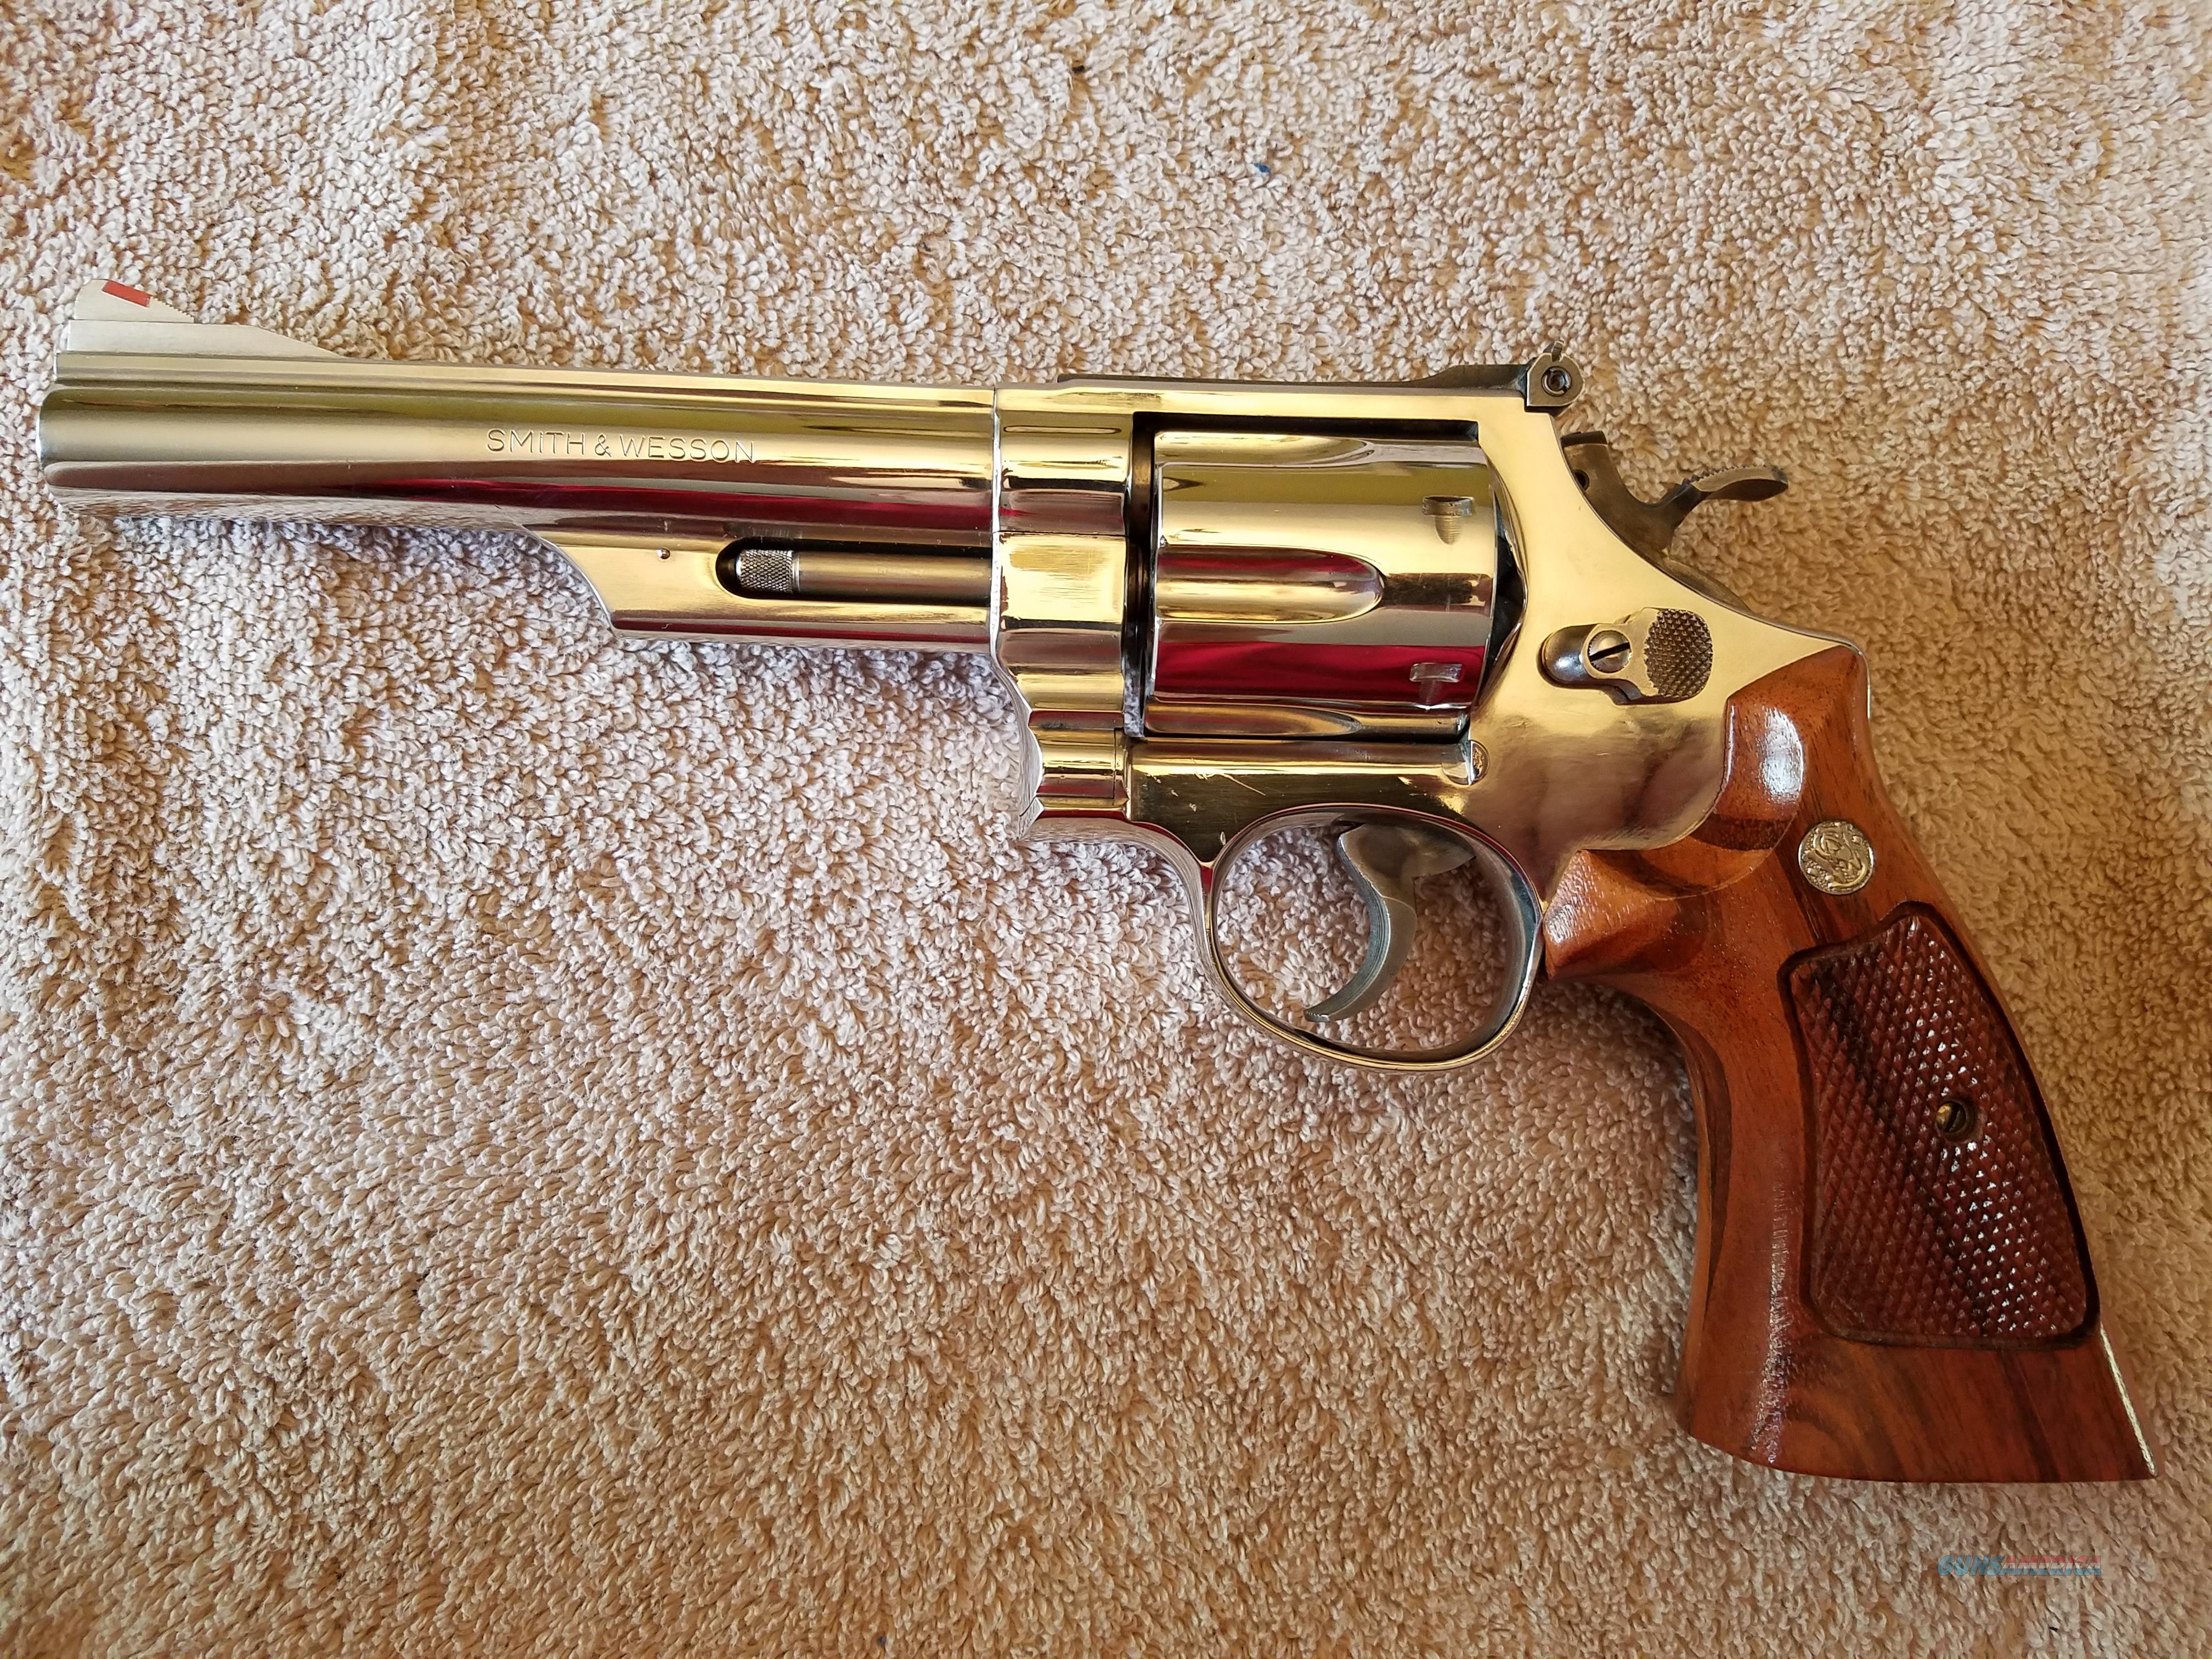 Smith & Wesson revolver Model 57 N suffix 41 magnum  Guns > Pistols > Smith & Wesson Revolvers > Full Frame Revolver